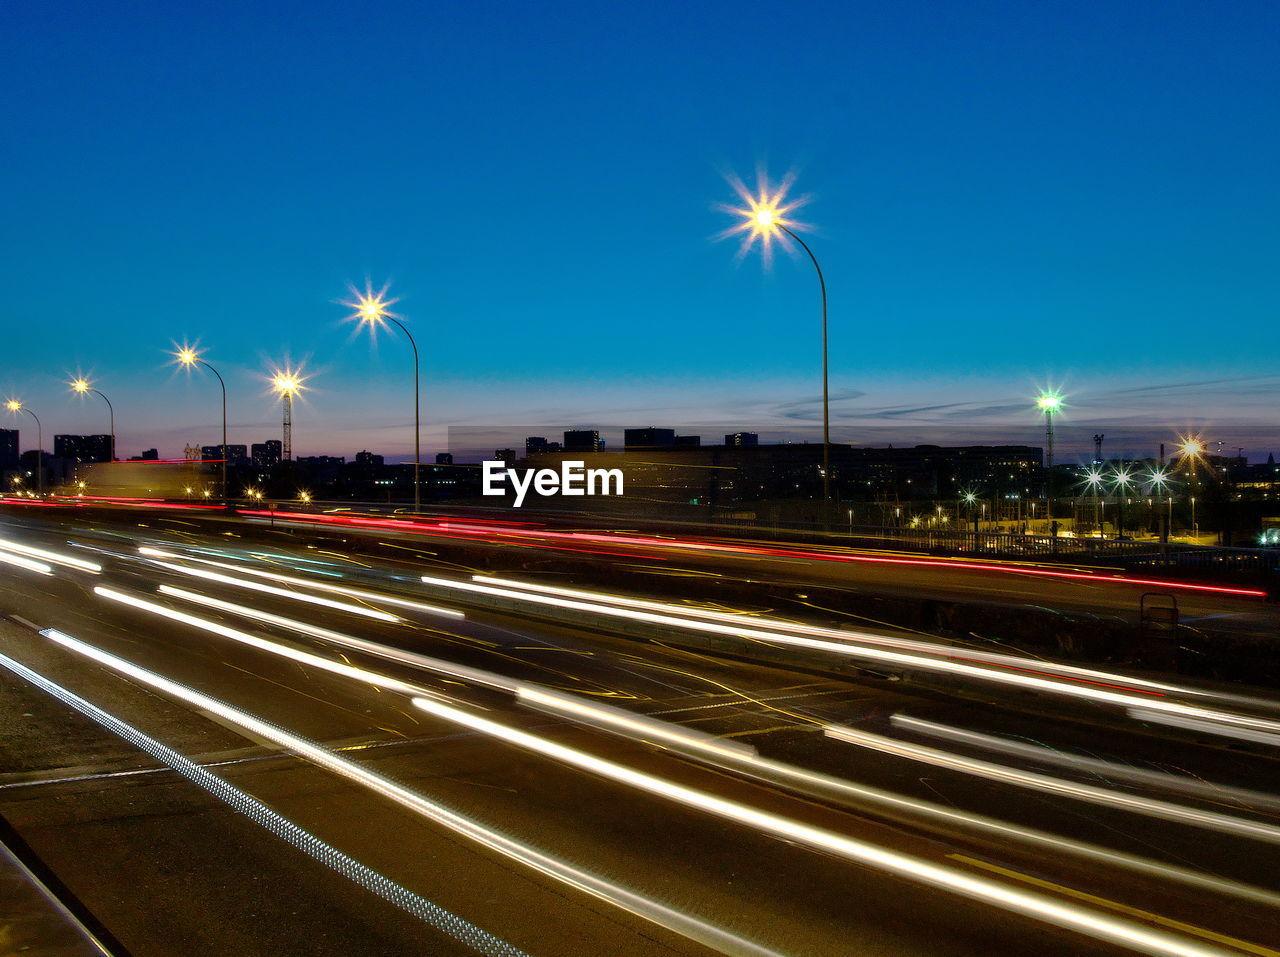 LIGHT TRAILS ON ROAD